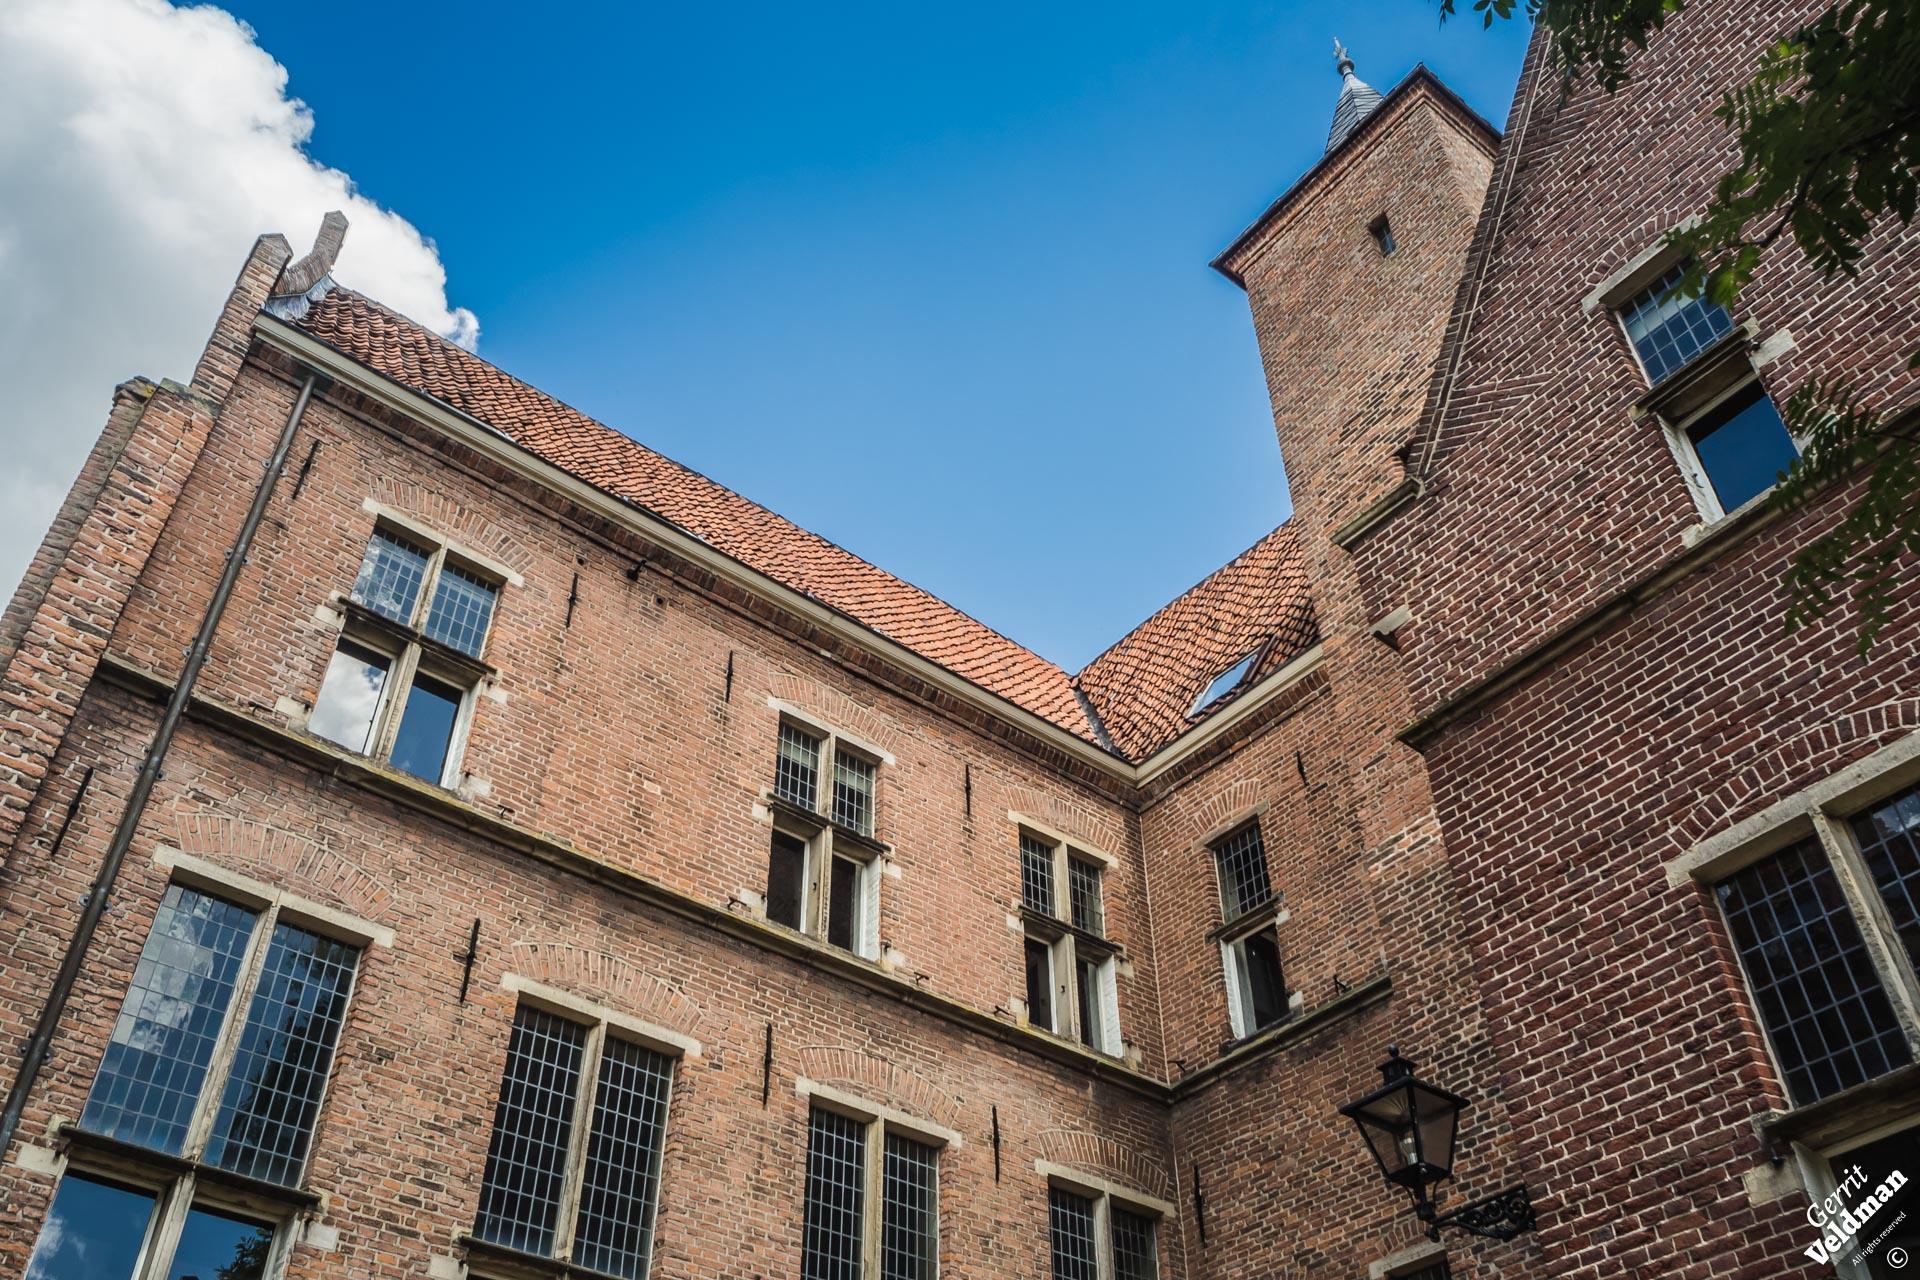 Weeme, Zwolle